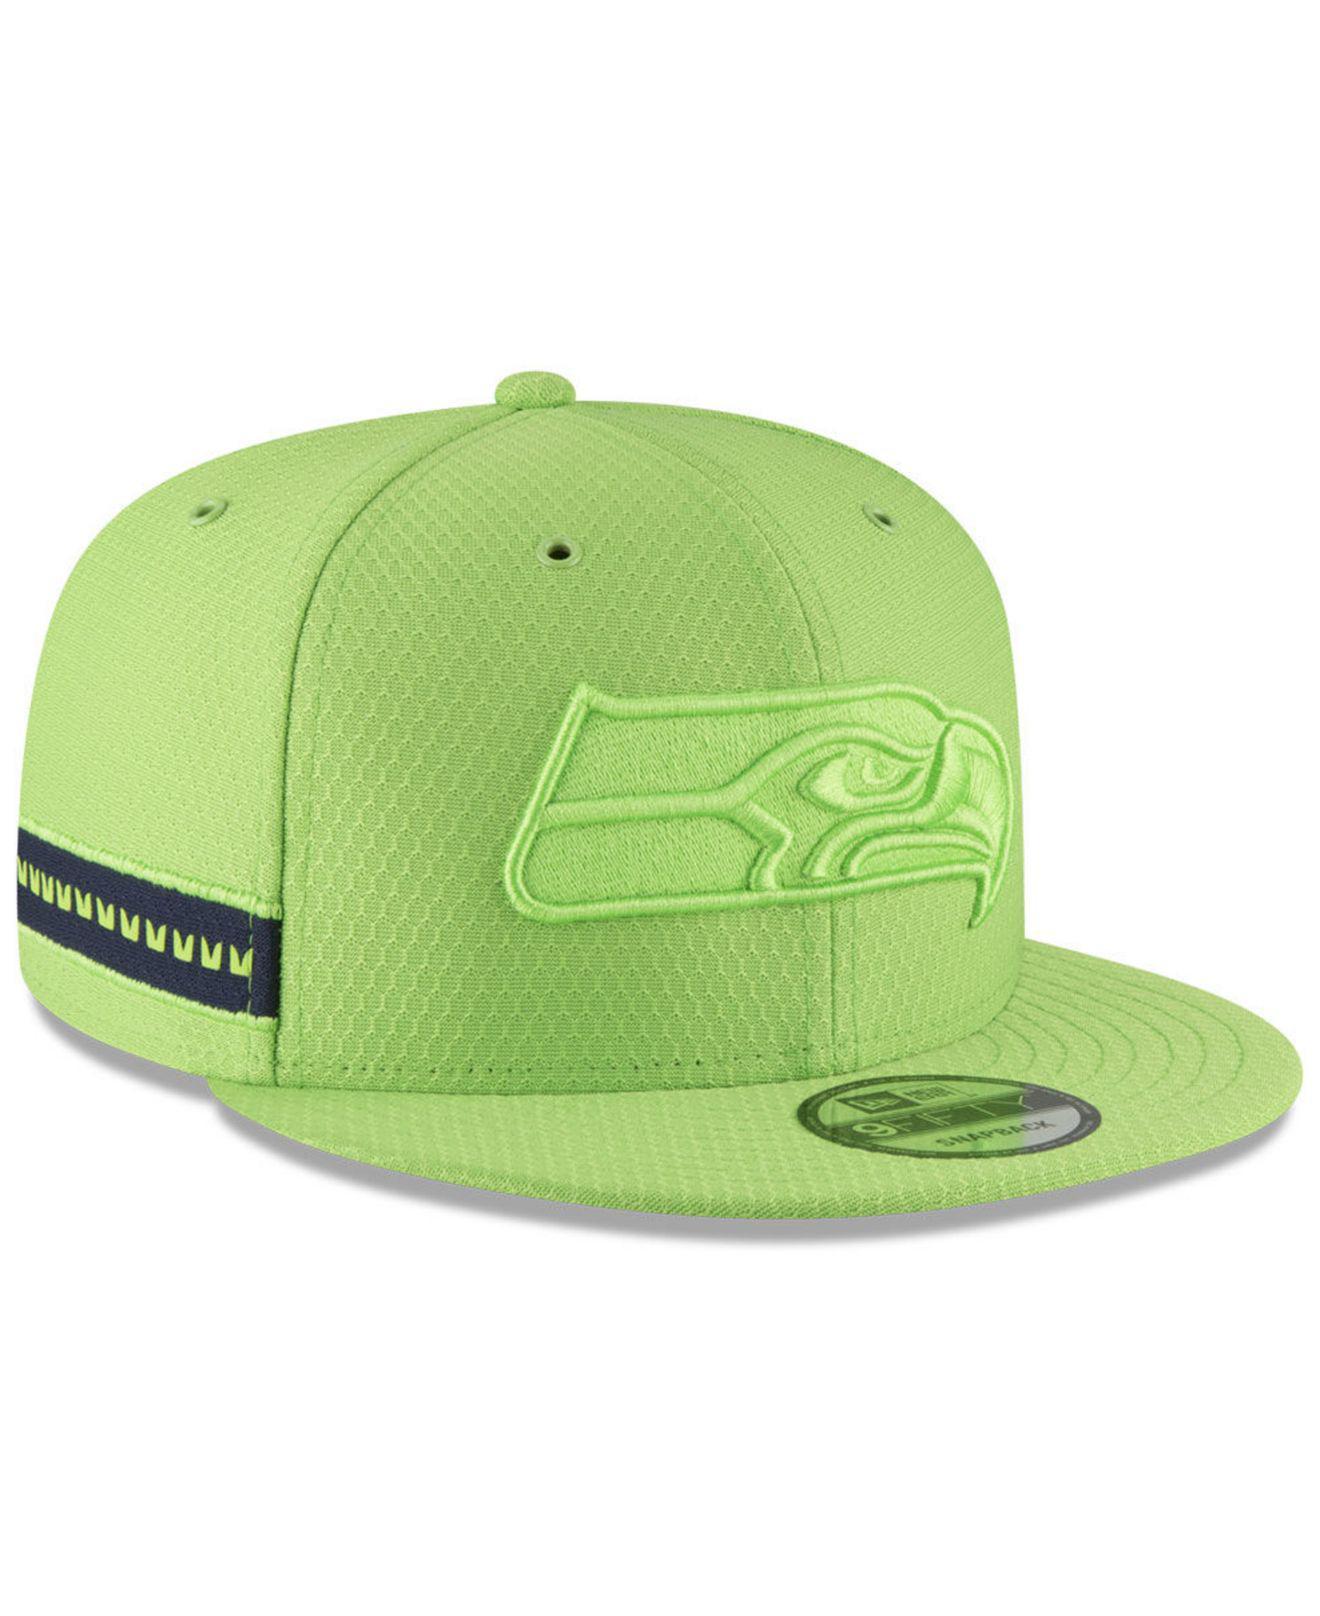 b95810e03 Lyst - KTZ Seattle Seahawks On Field Color Rush 9fifty Snapback Cap ...